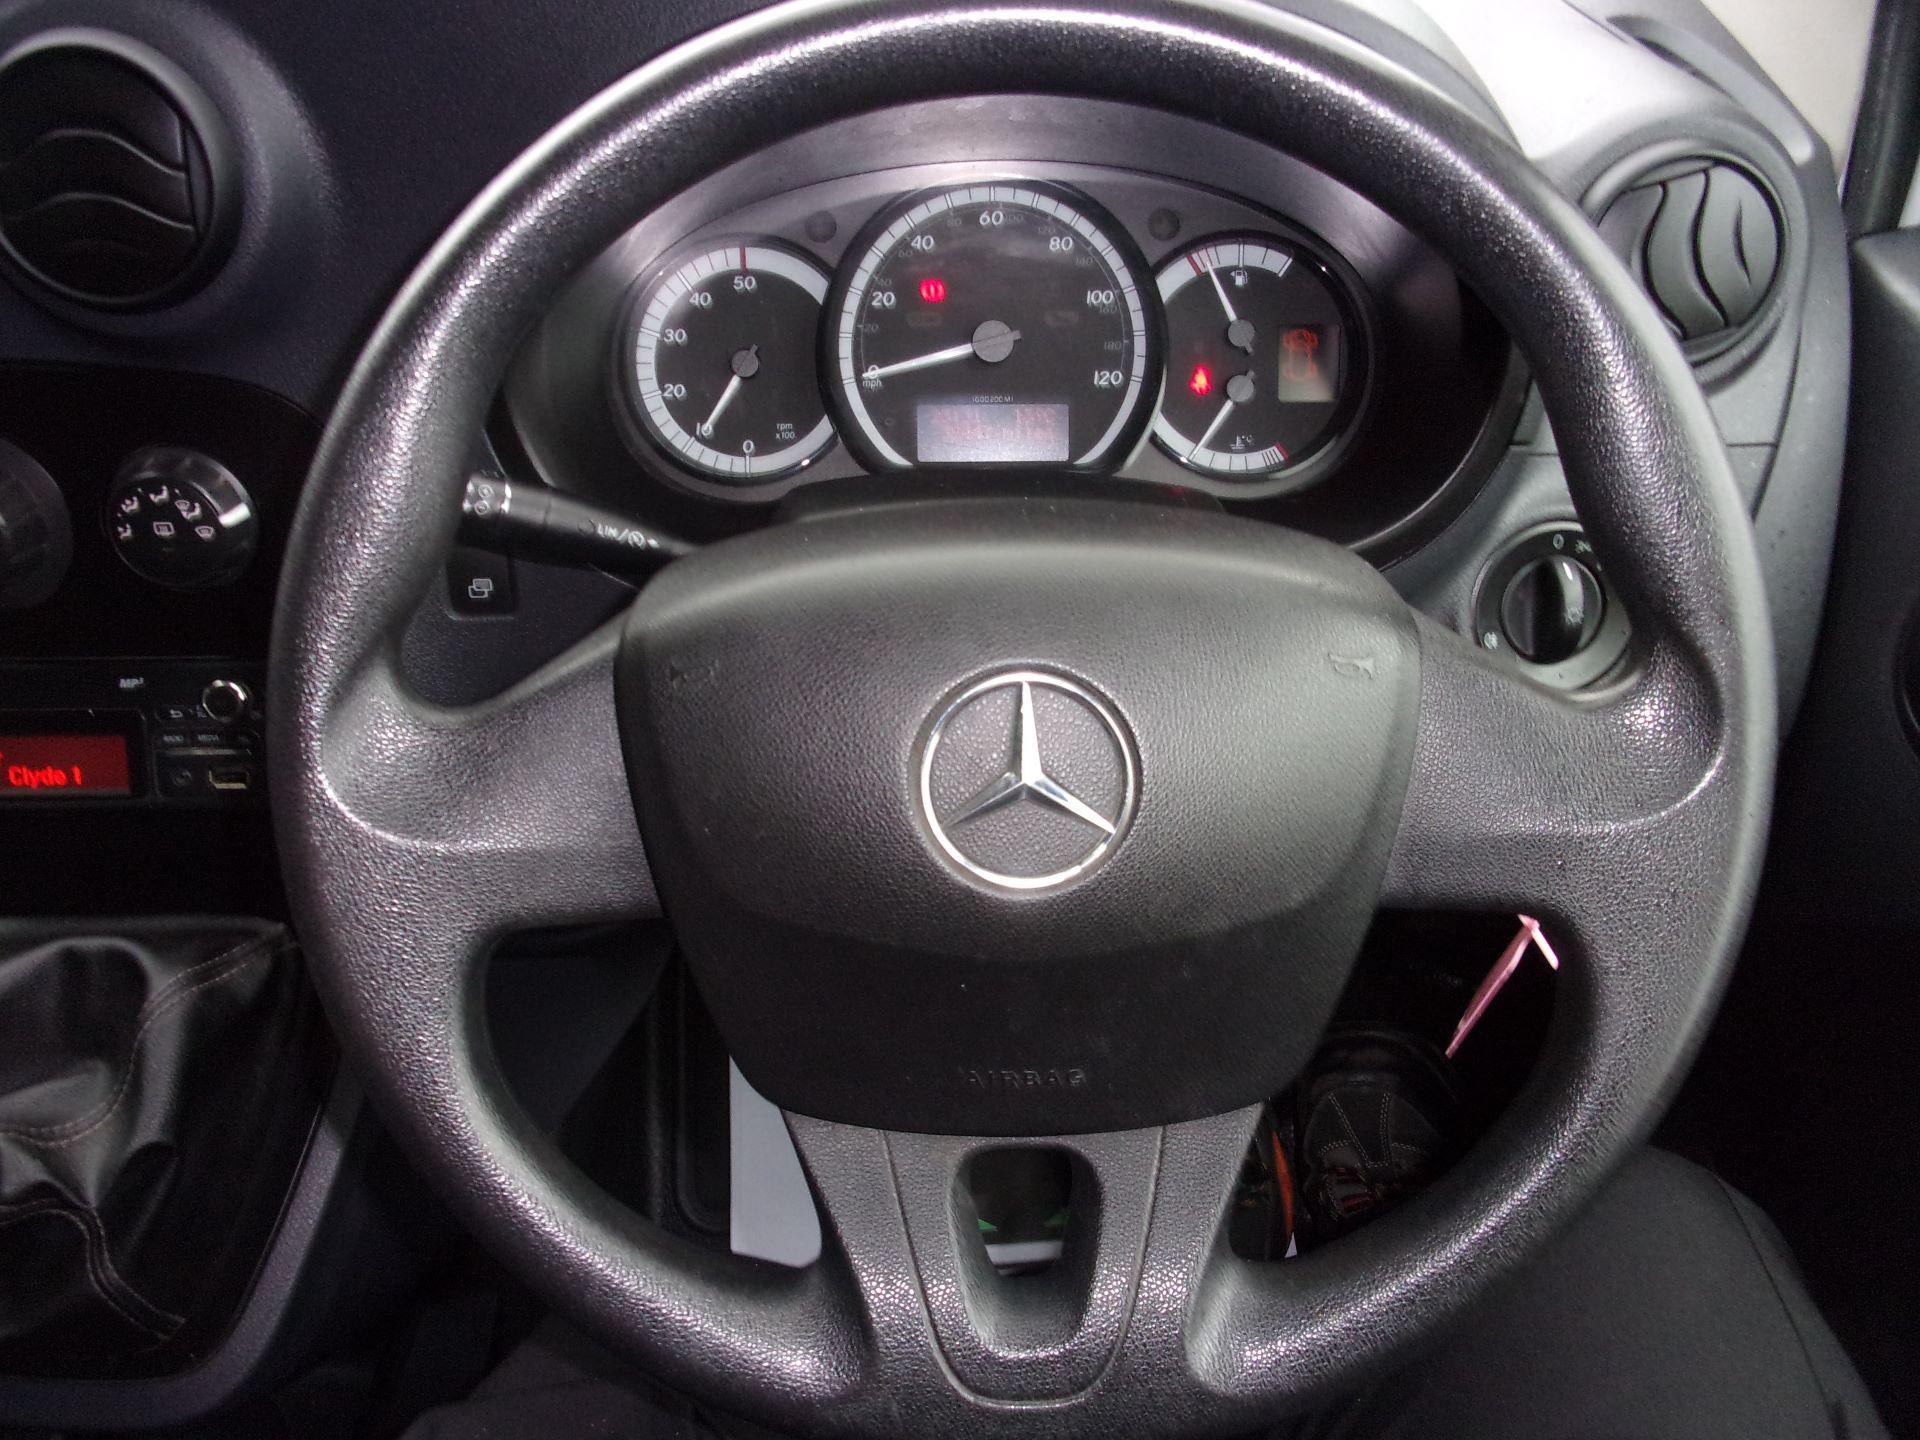 2016 Mercedes-Benz Citan LWB 109 CDI VAN EURO 5 (NK16ORG) Image 5